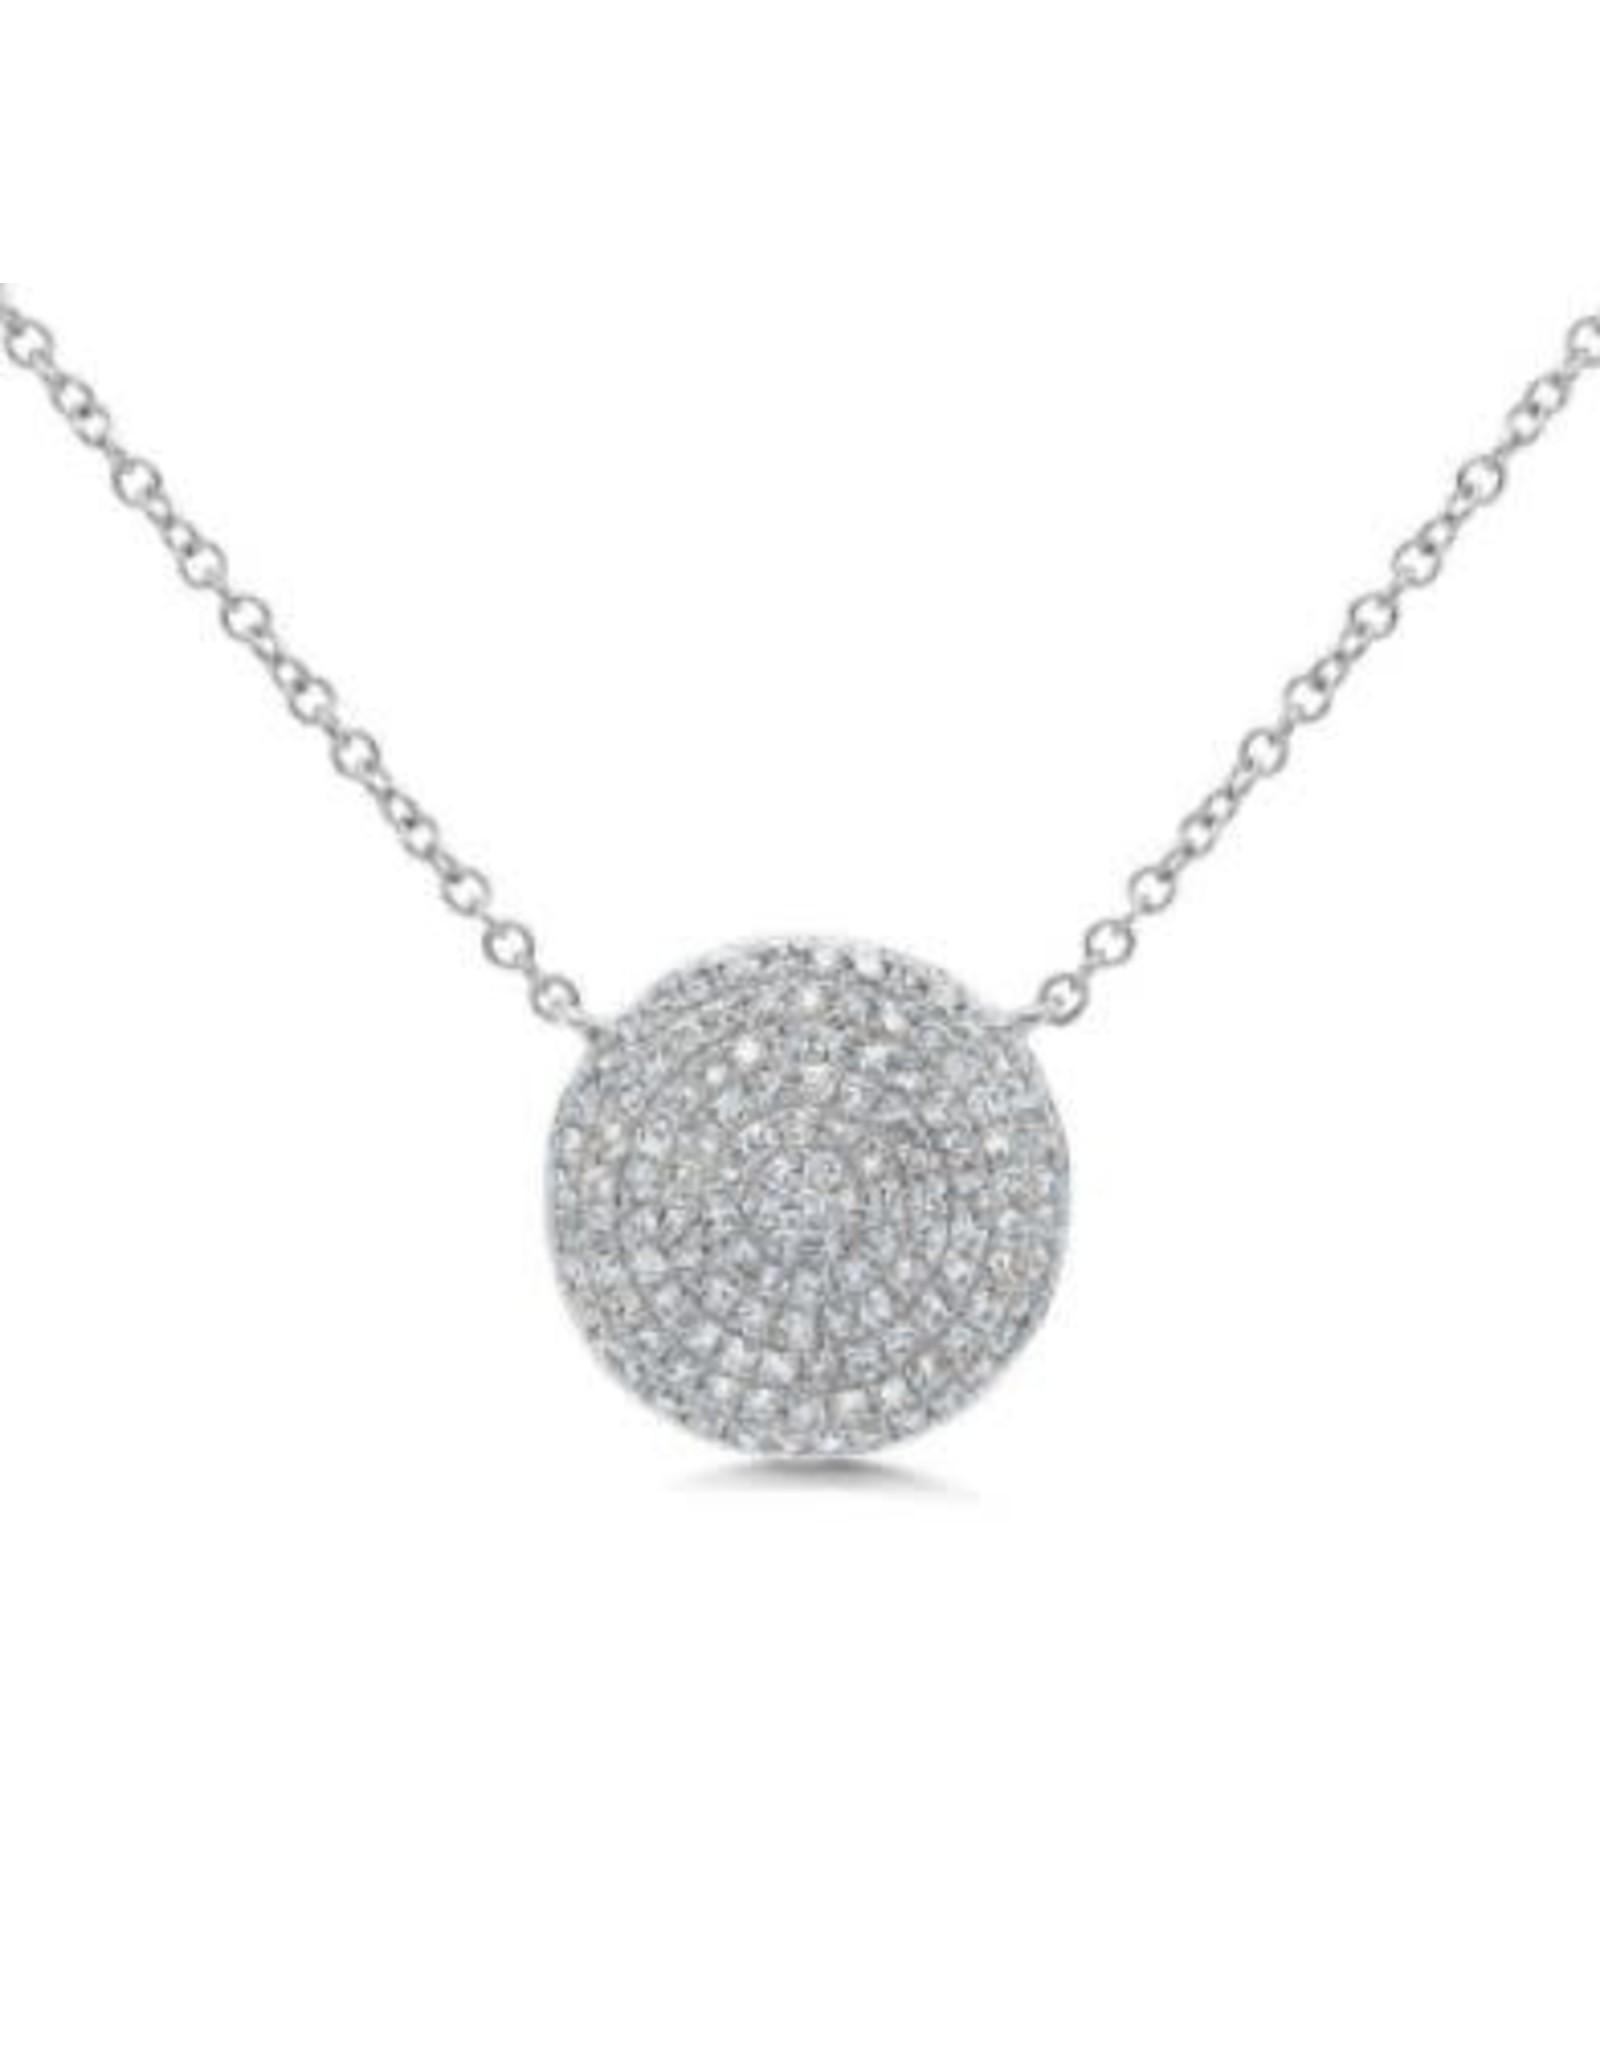 14K White Gold Pave Diamond Circle Necklace, D: 0.37ct